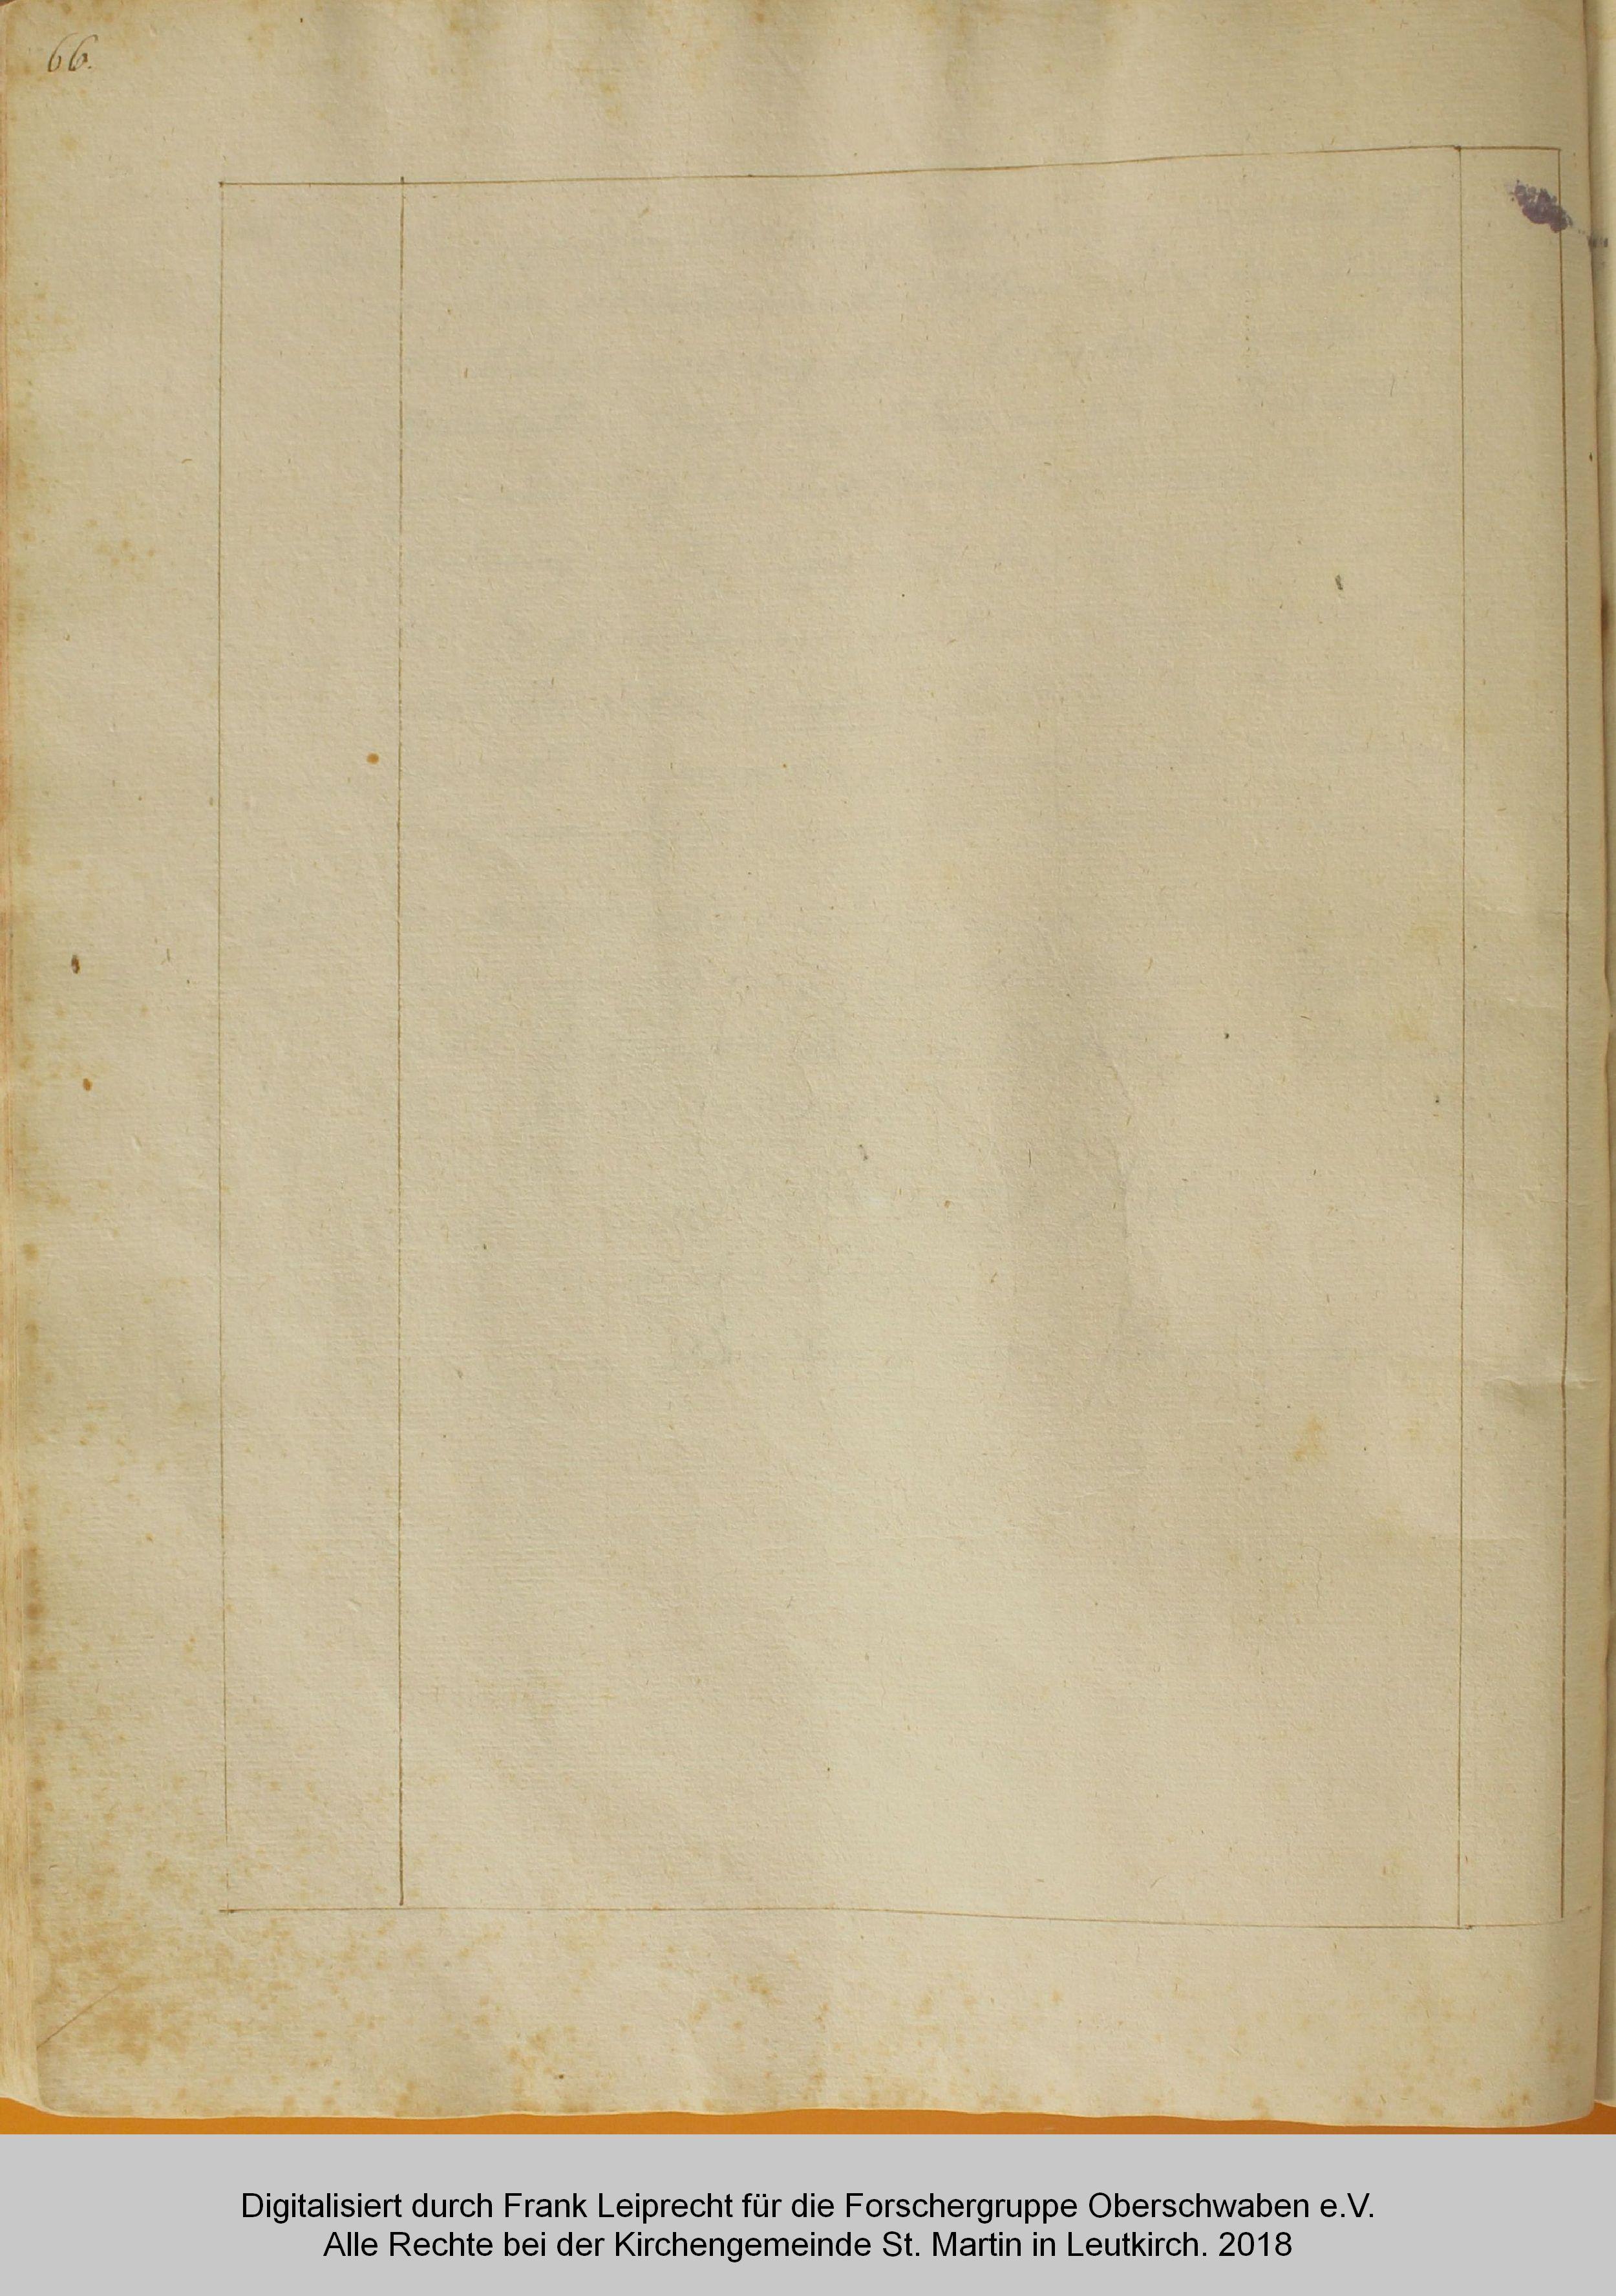 Seite 066